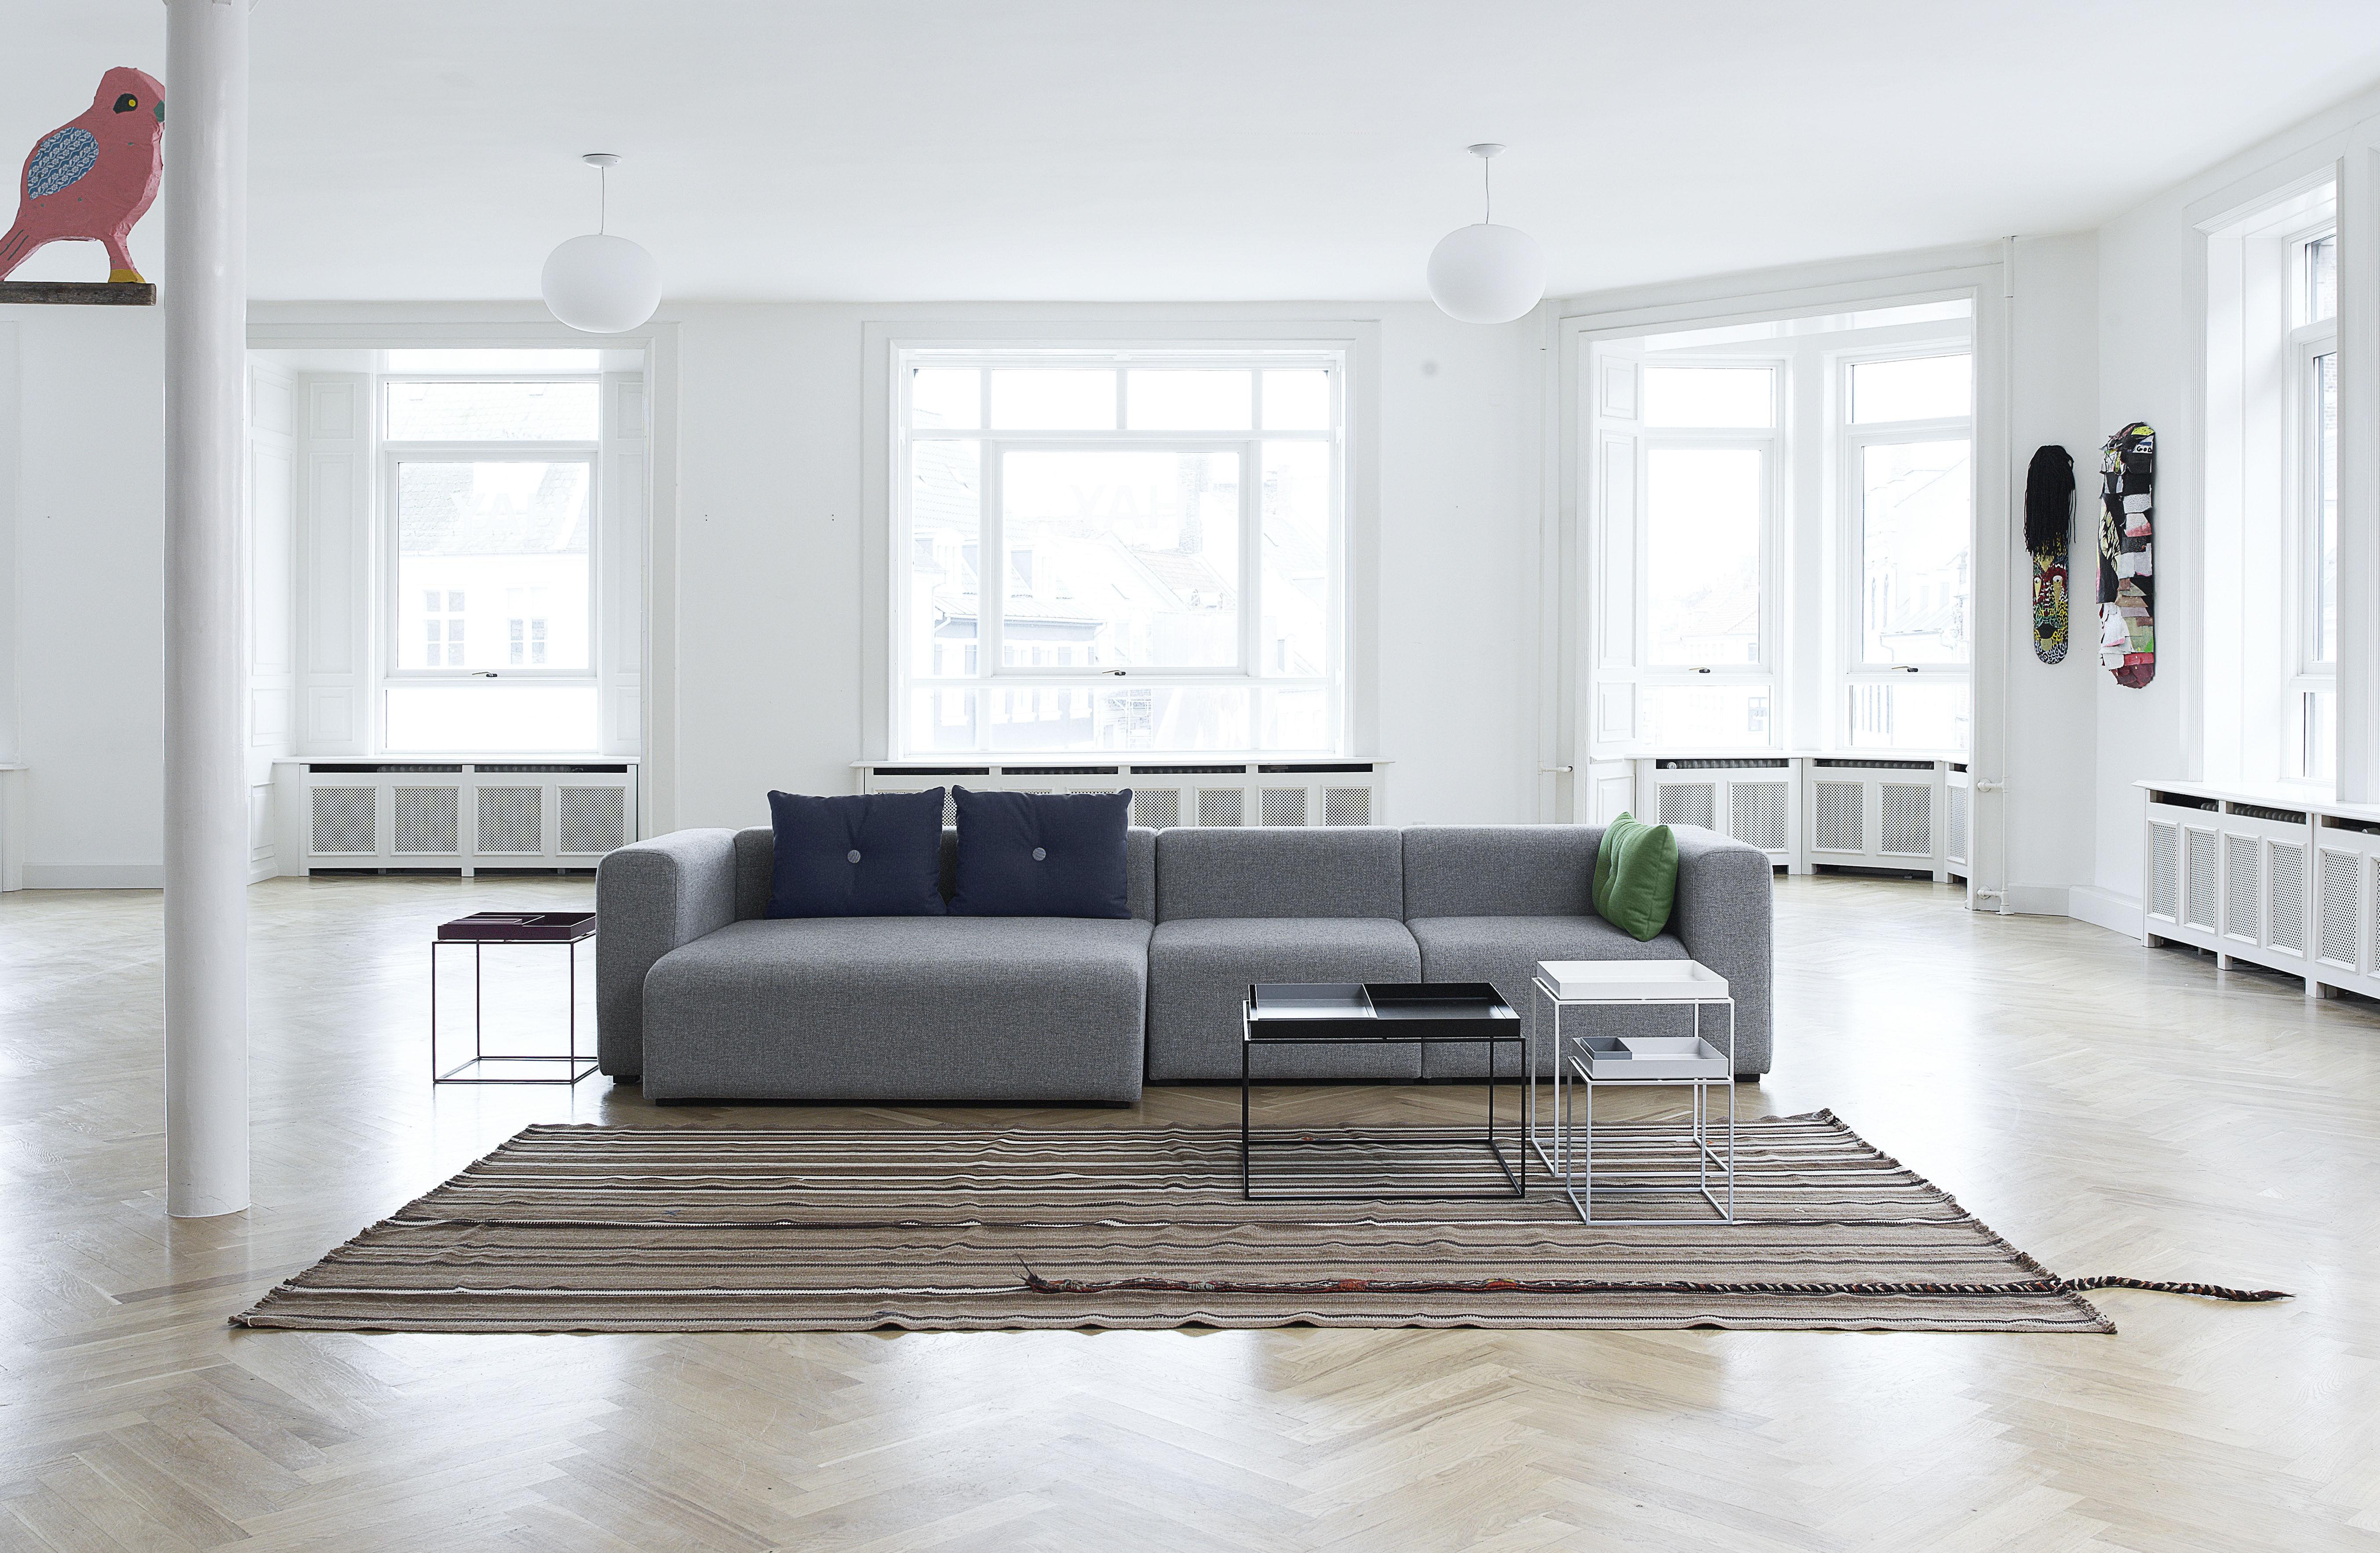 tray couchtisch h 50 cm 60 x 40 cm hay wei ebay. Black Bedroom Furniture Sets. Home Design Ideas